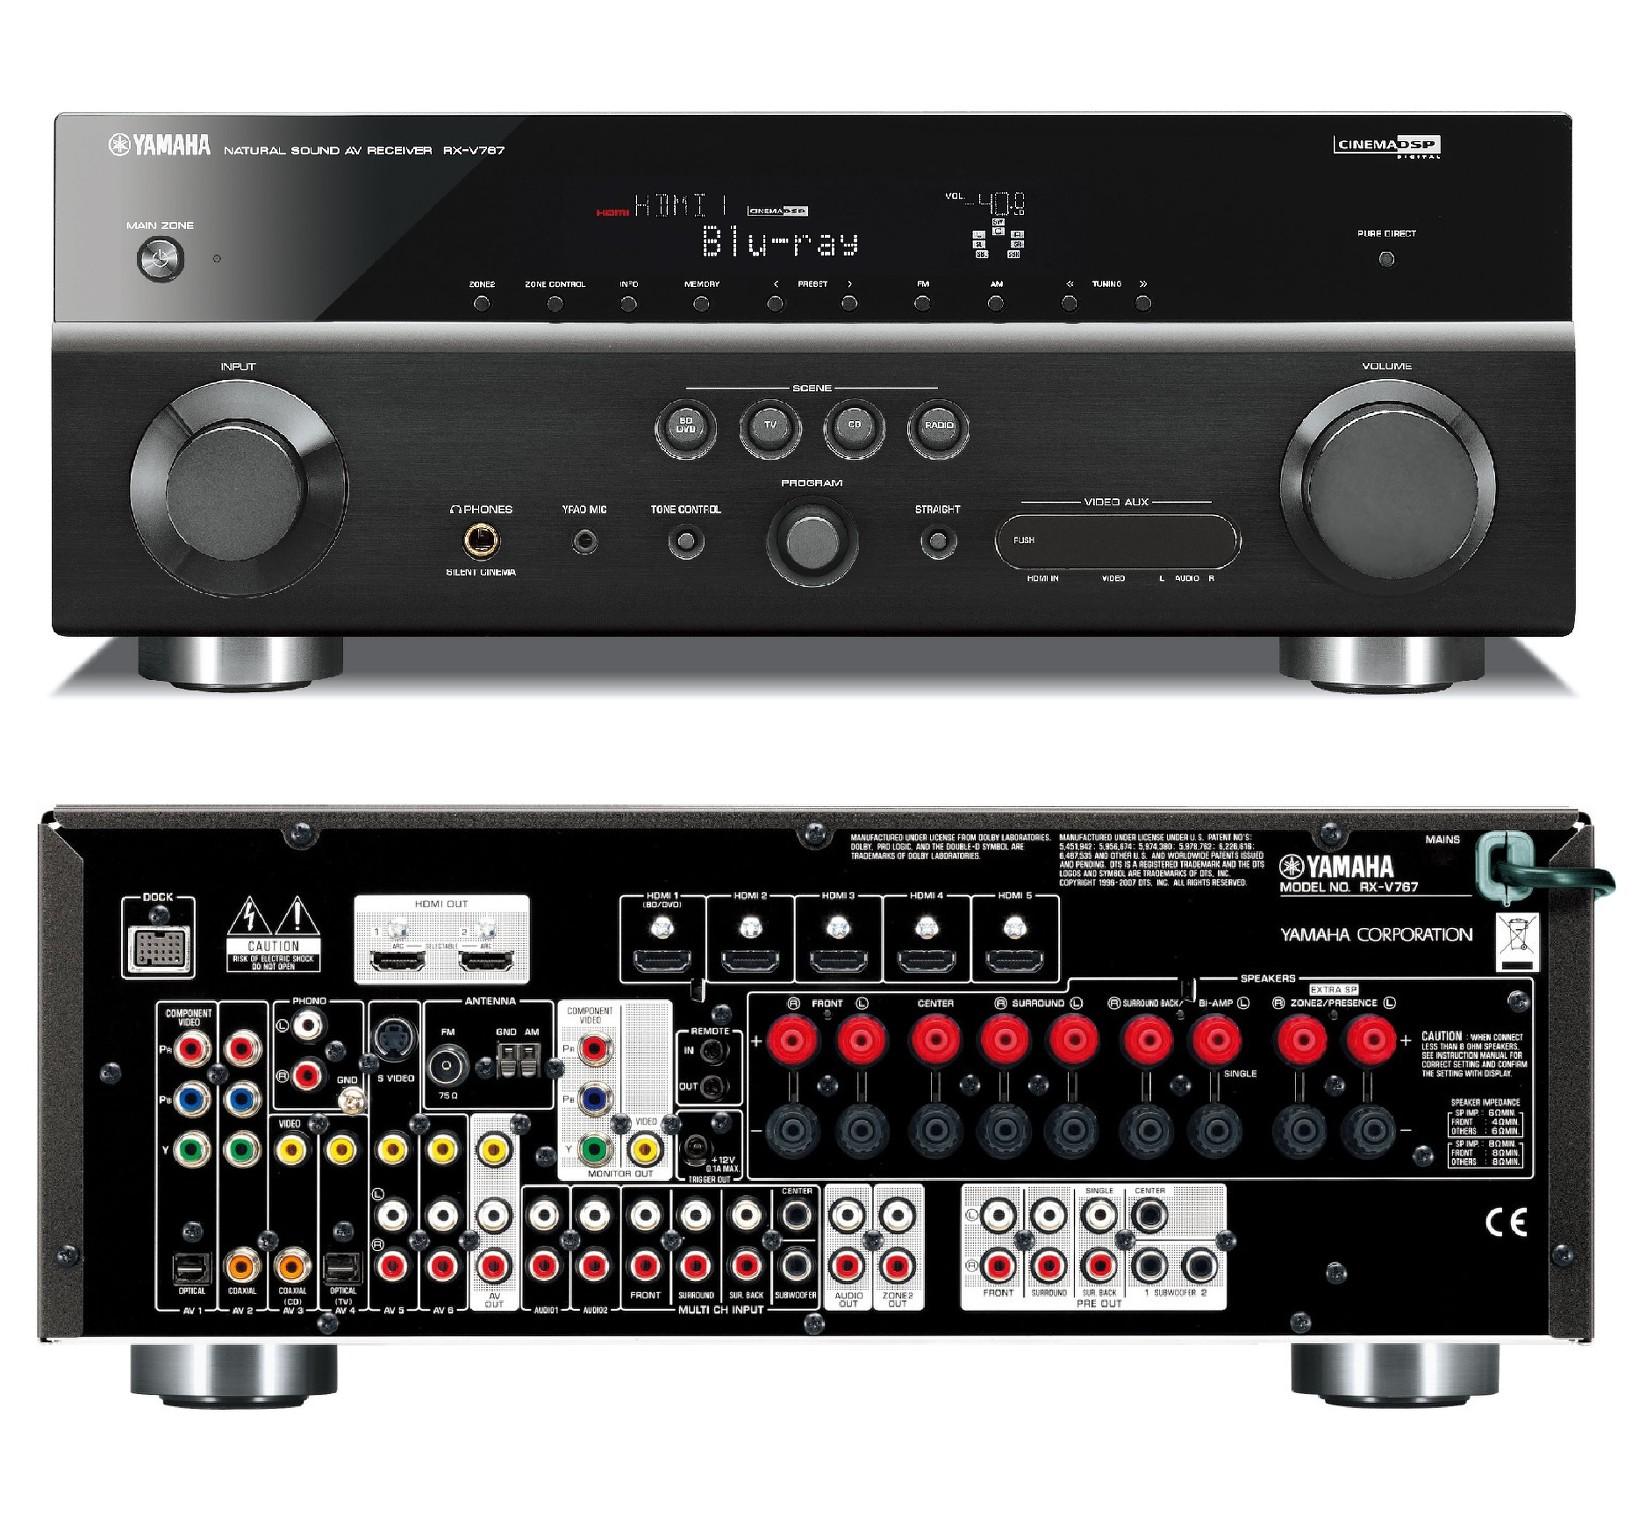 Yamaha RX-V767 Home Cinema 7.1 3D AV Receiver 6/2 HDMI